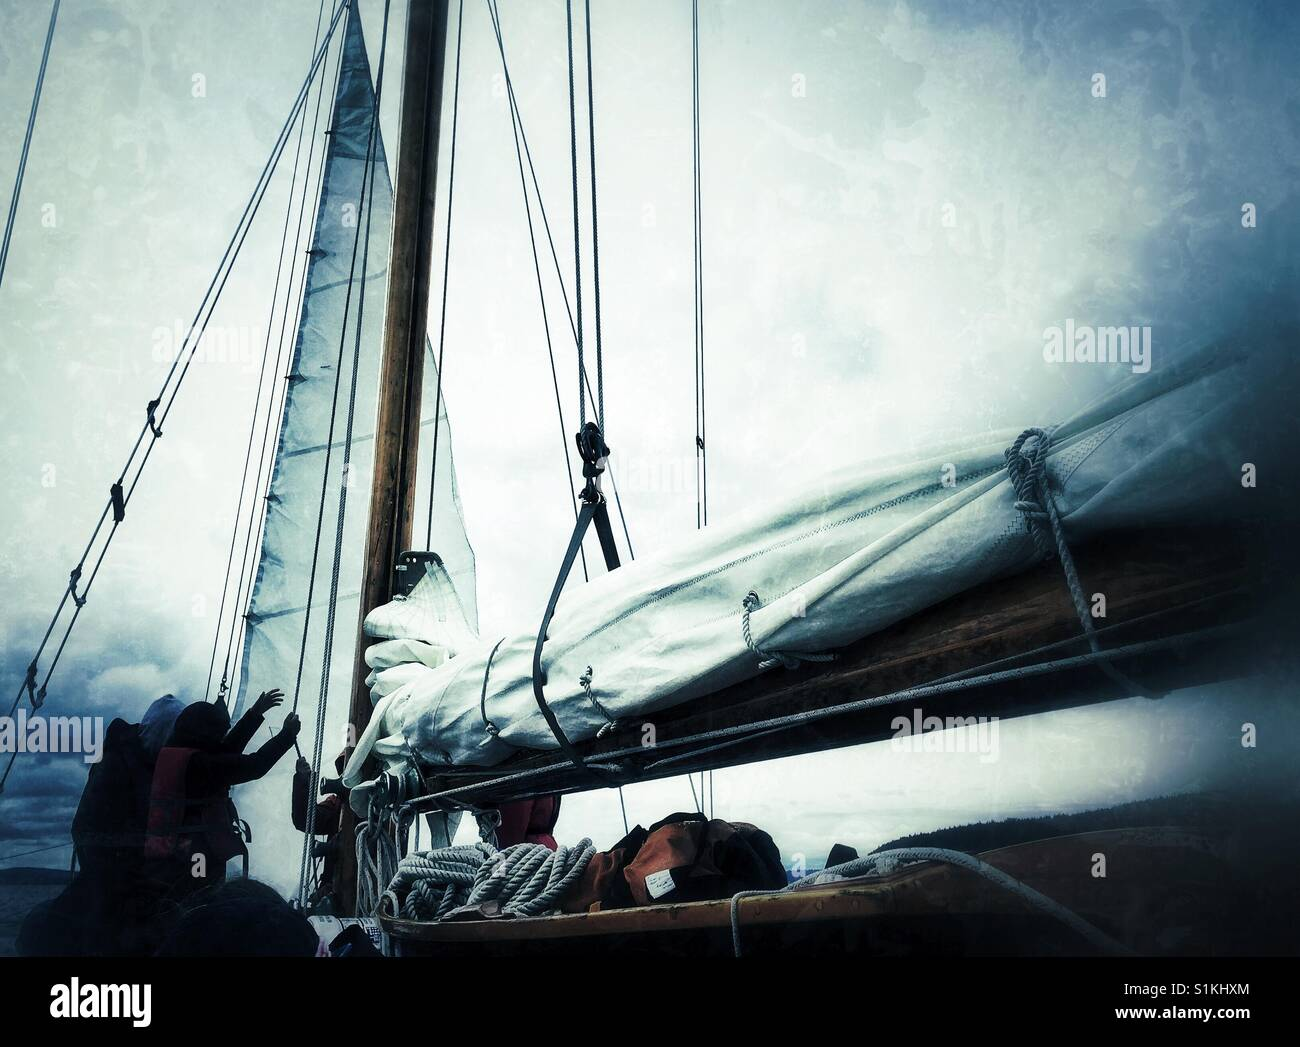 hoisting the mainsail - Stock Image